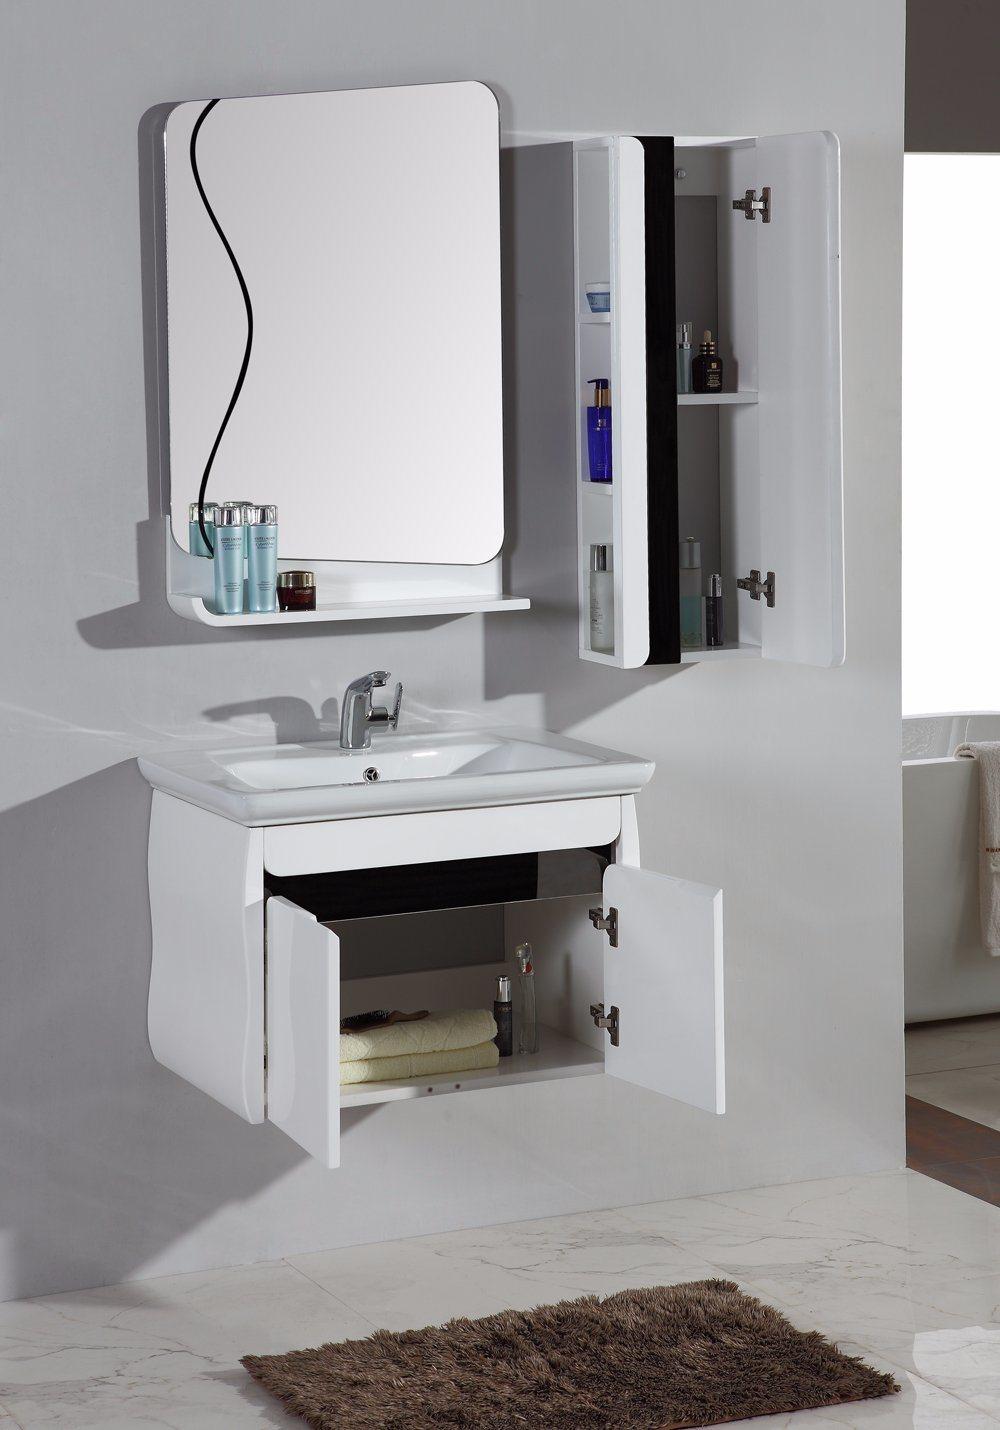 The Latest MDF White Lacquer Bathroom Furniture Cabinet